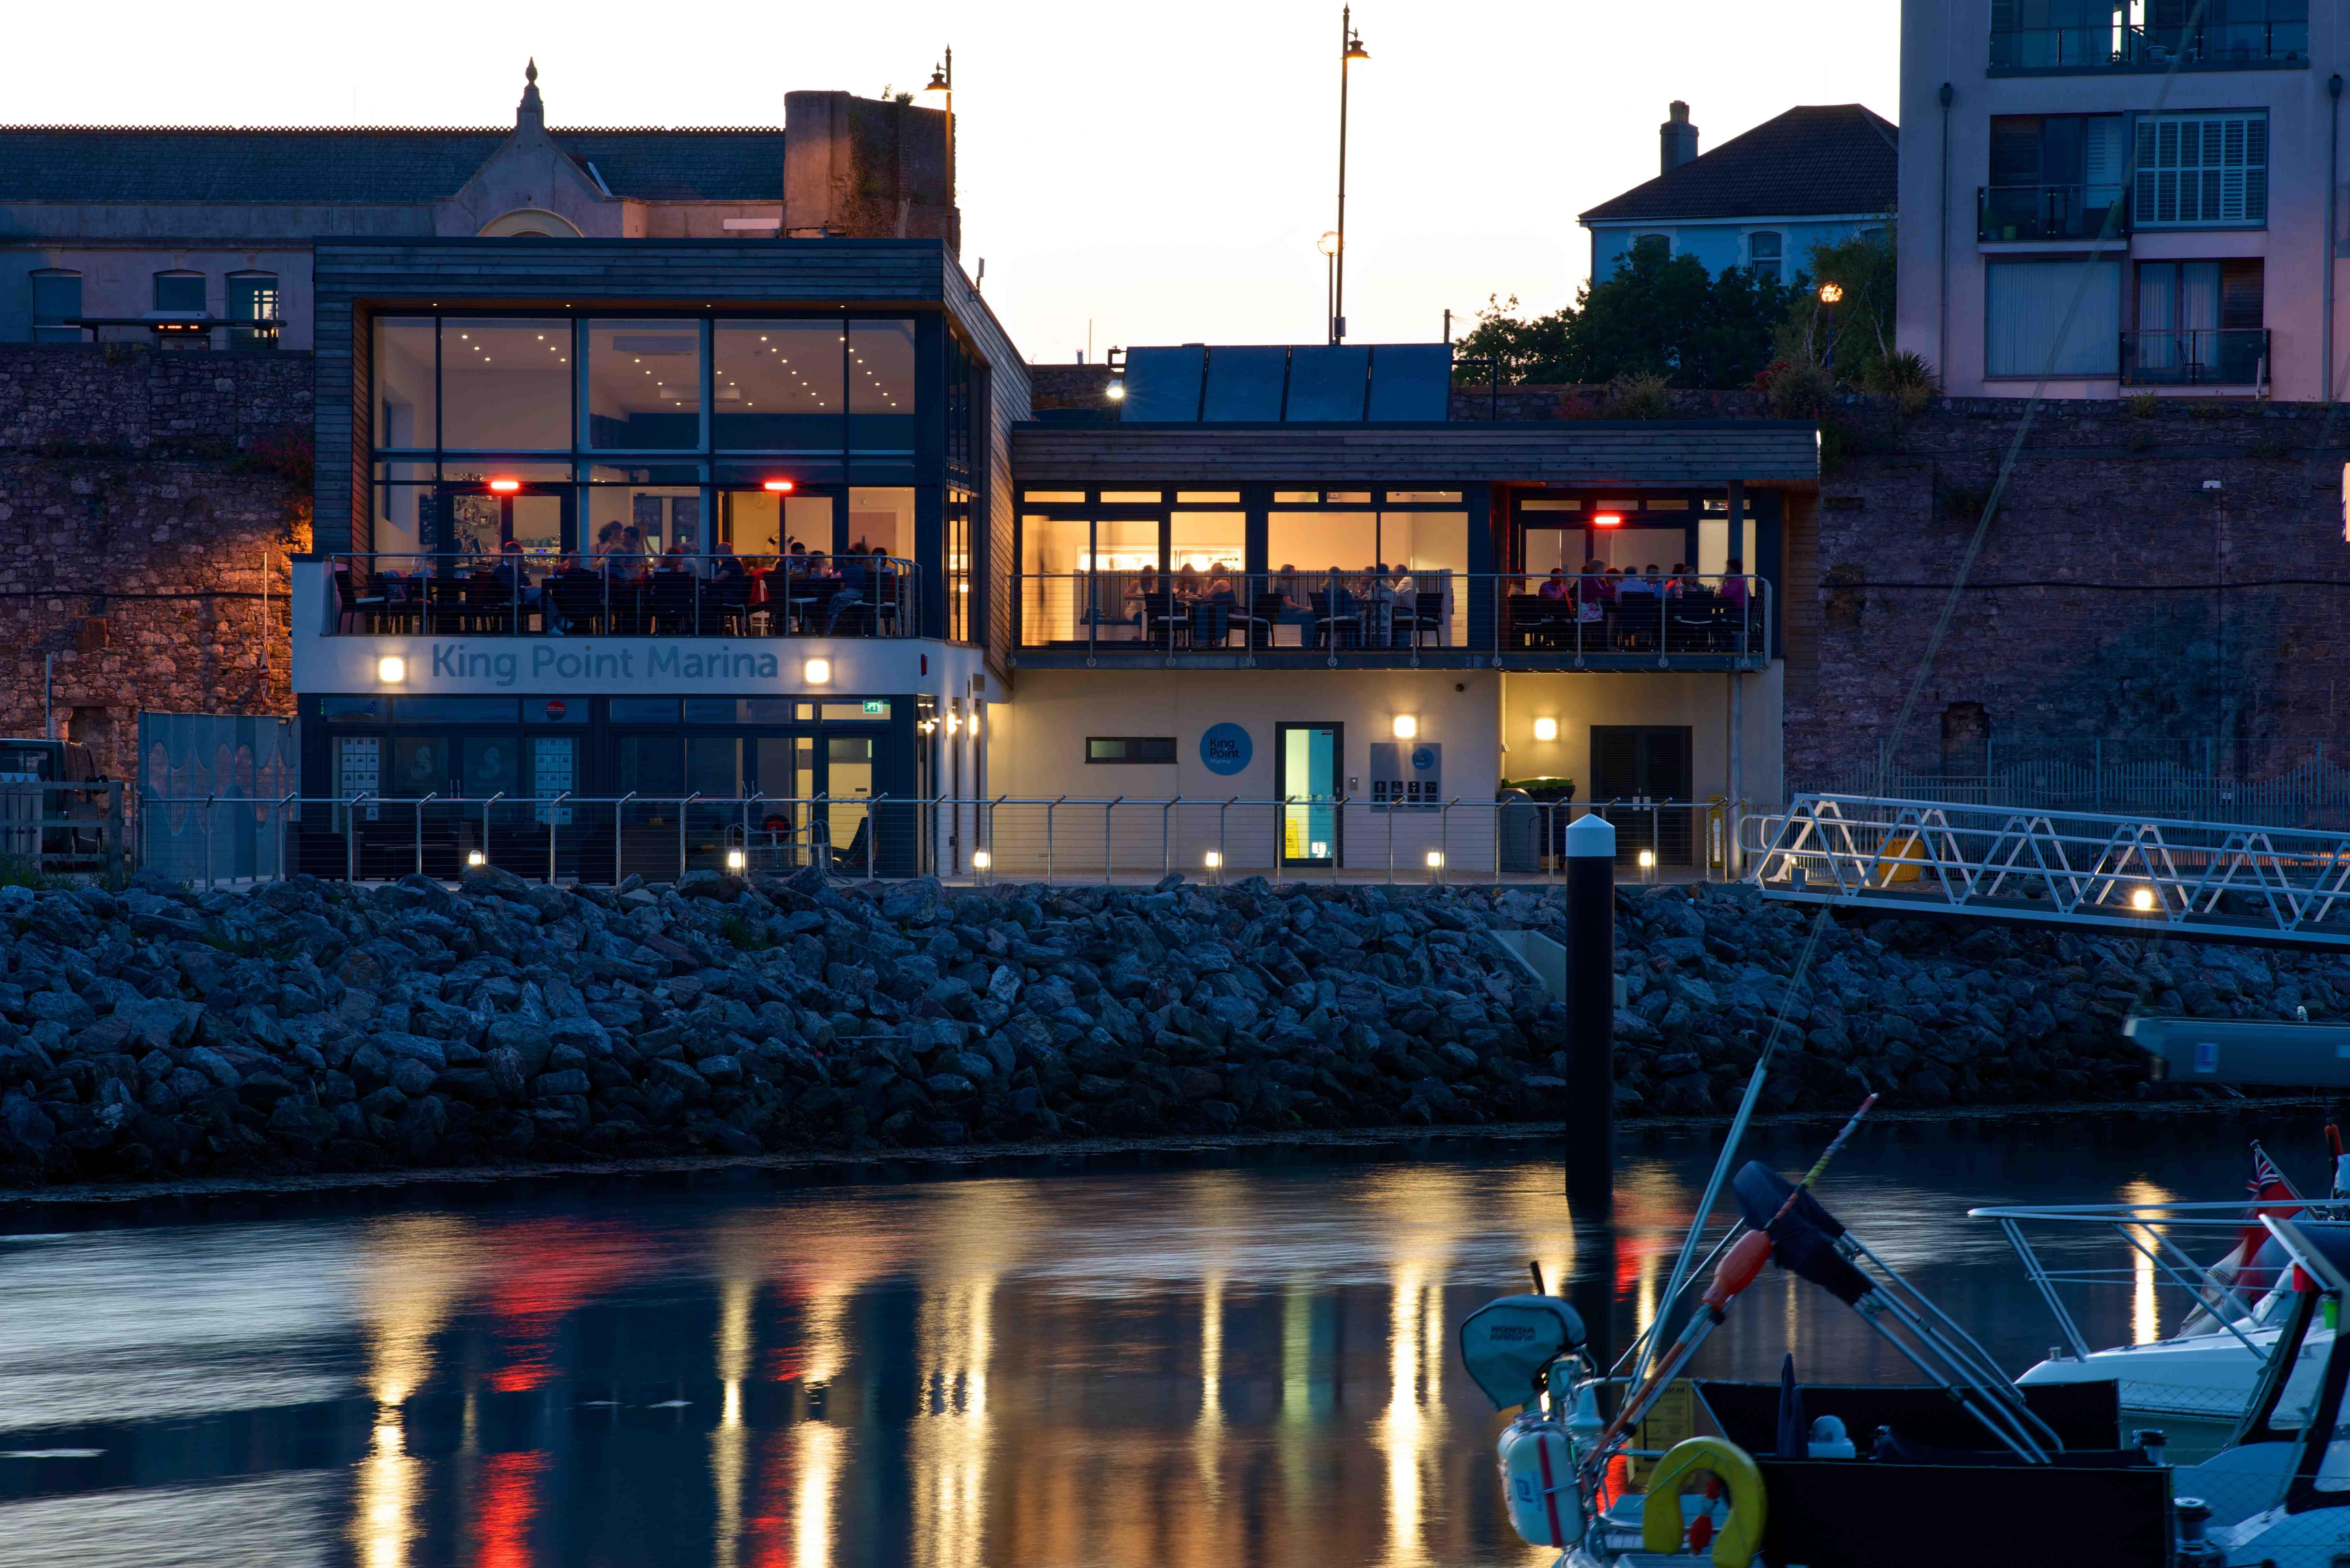 #Leisure #Tourism #Devon #Cornwall #Ocean #Sea #Sailing #Travelling #Yacht #KingPointMarina #Berthing #Plymouth